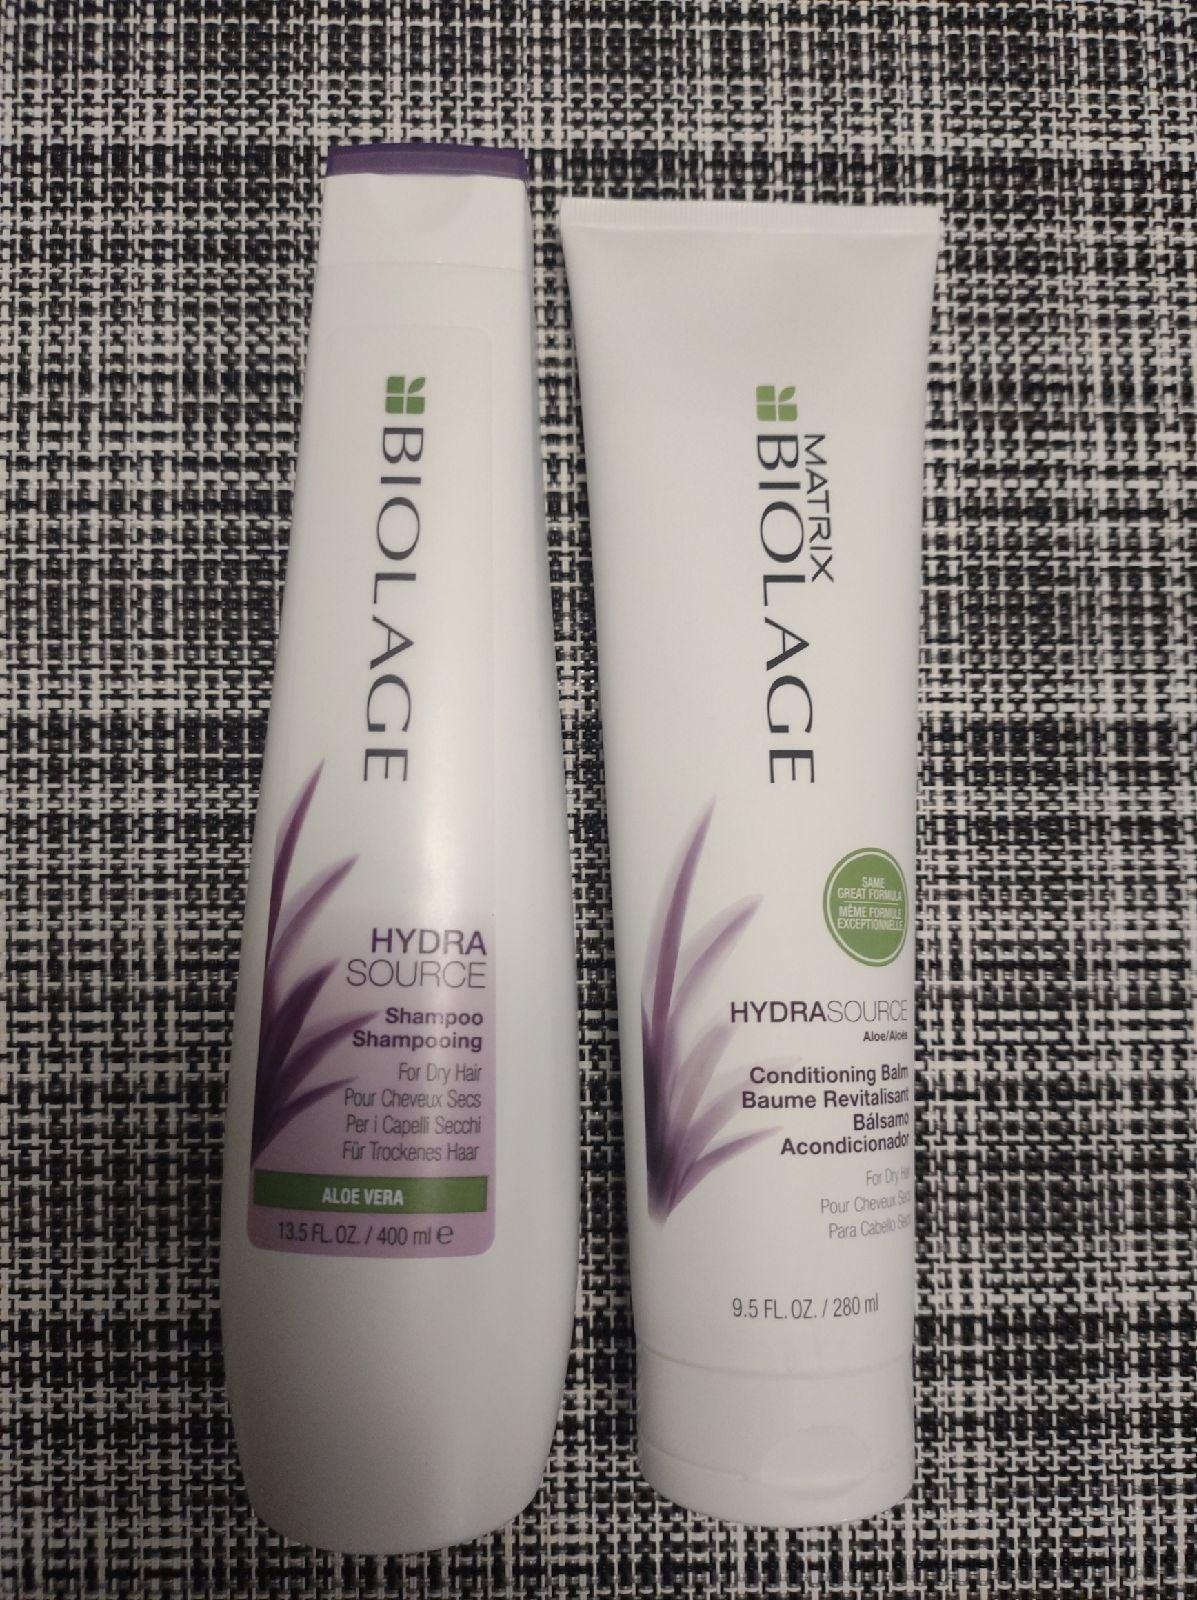 Matrix Biolage Hydrasource Shampoo Duo